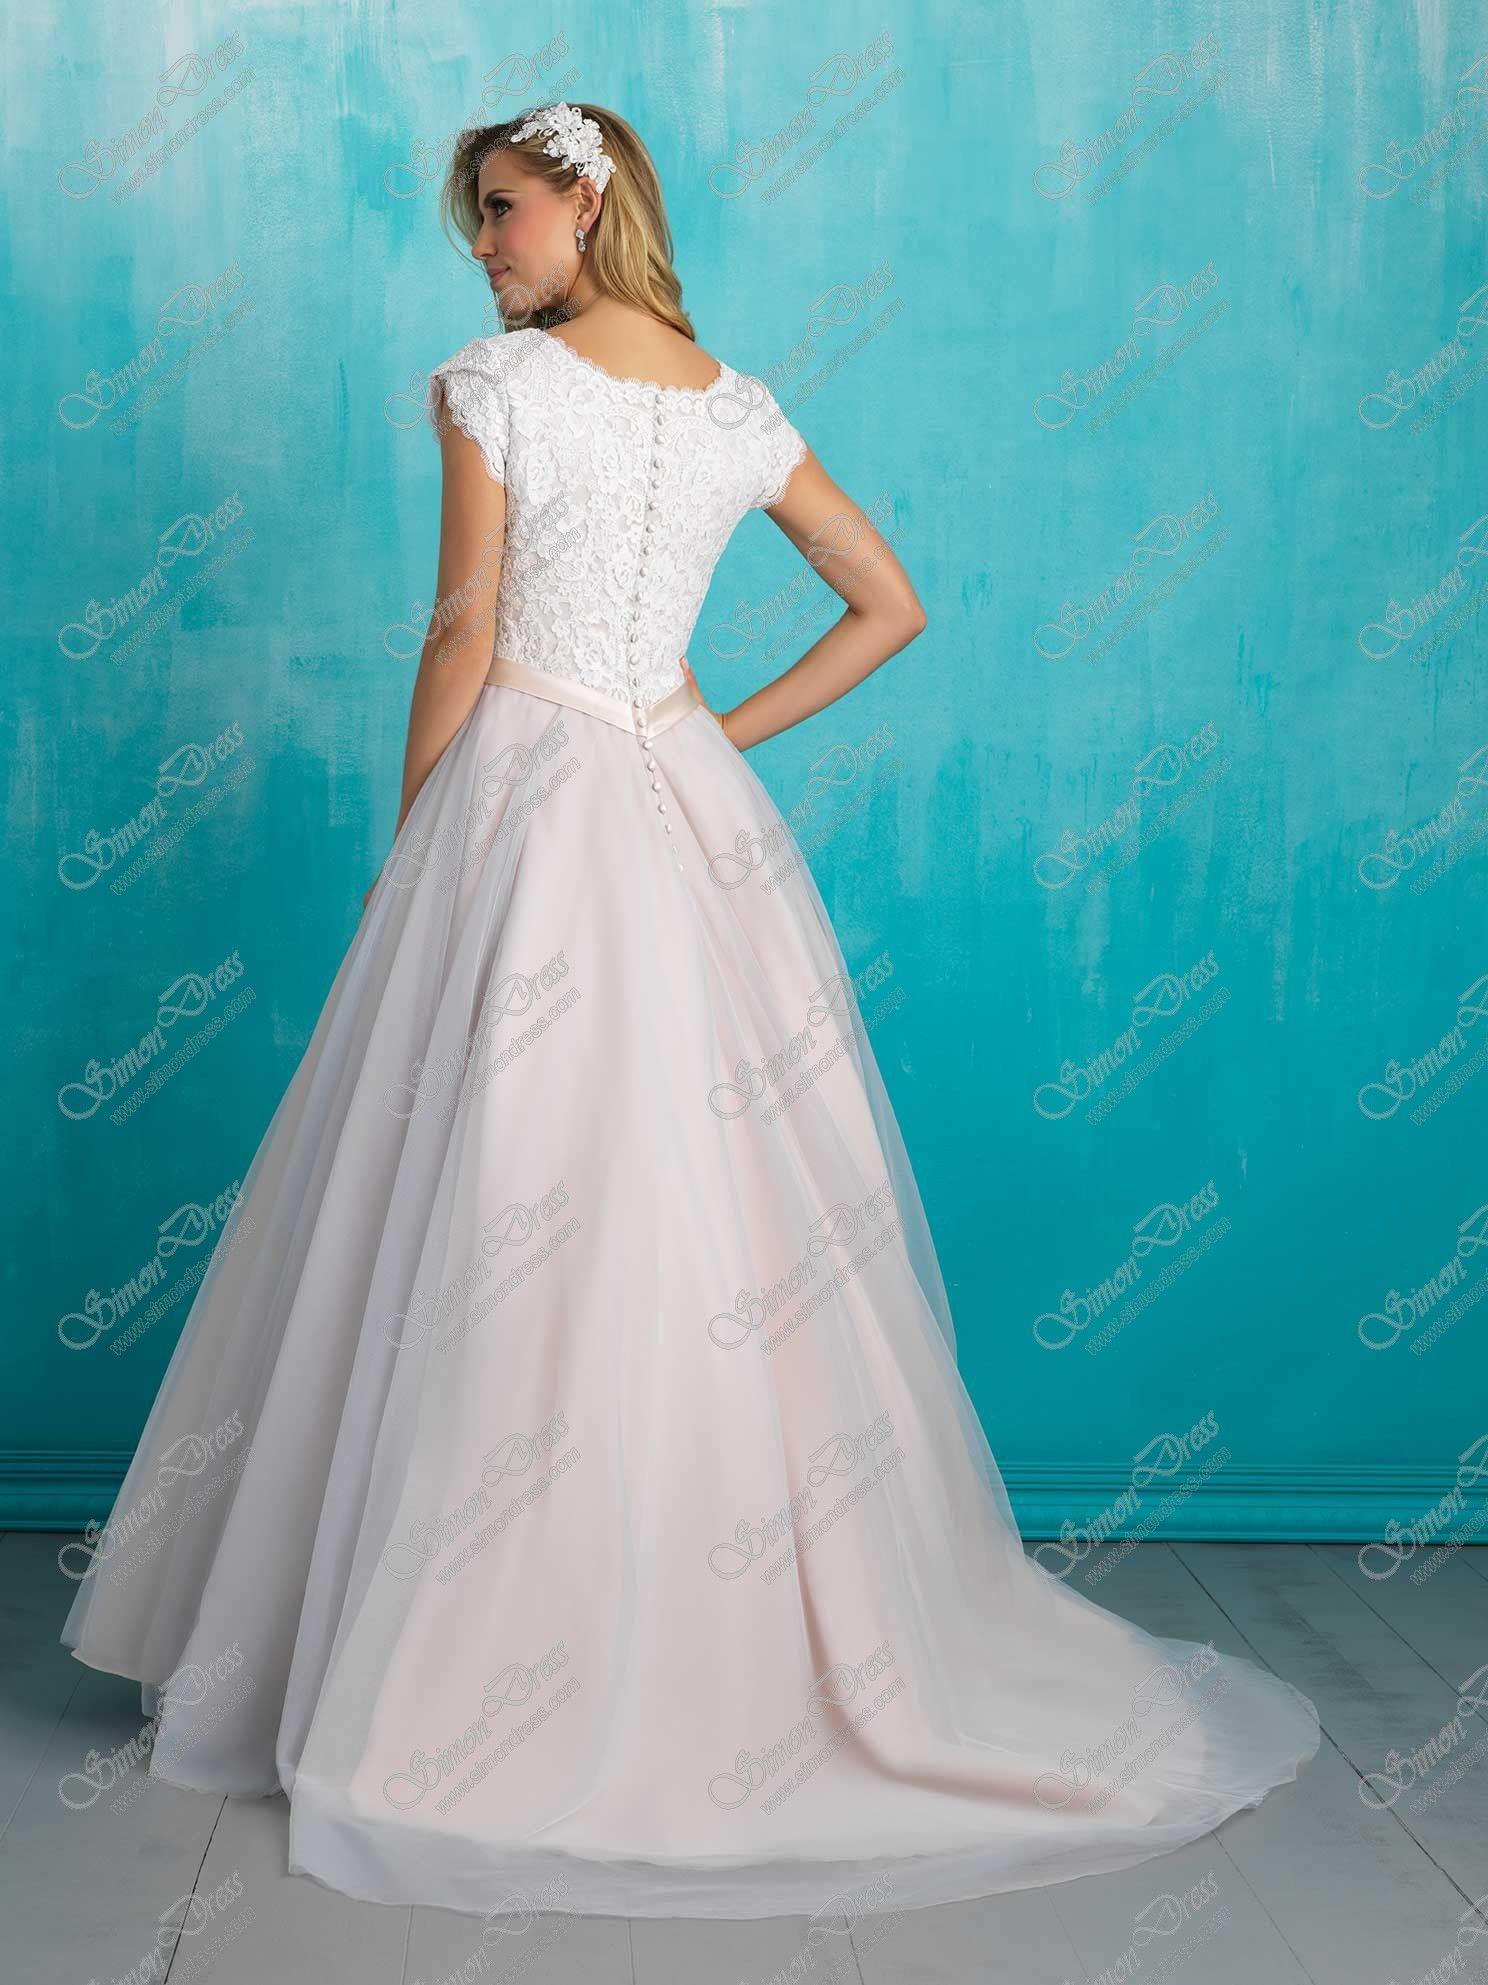 Pretty Prom Dresses In Ogden Utah Gallery - Wedding Ideas ...